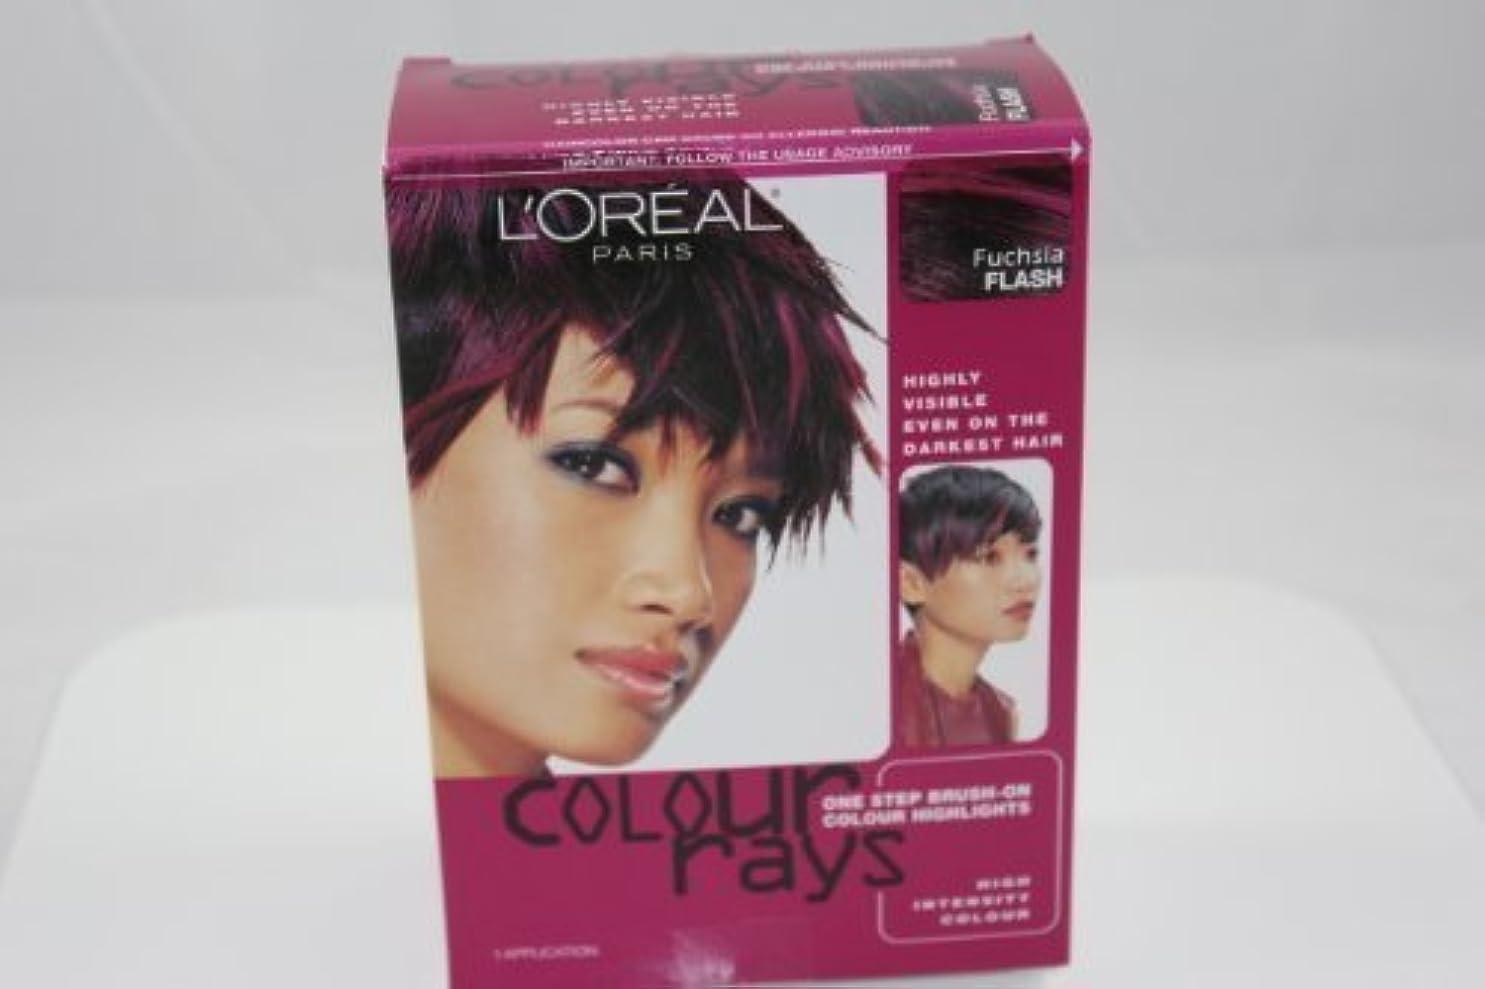 L'Oreal Paris Colour Rays Hair Color, Fuschia Flash by L'Oreal Paris Hair Color [並行輸入品]